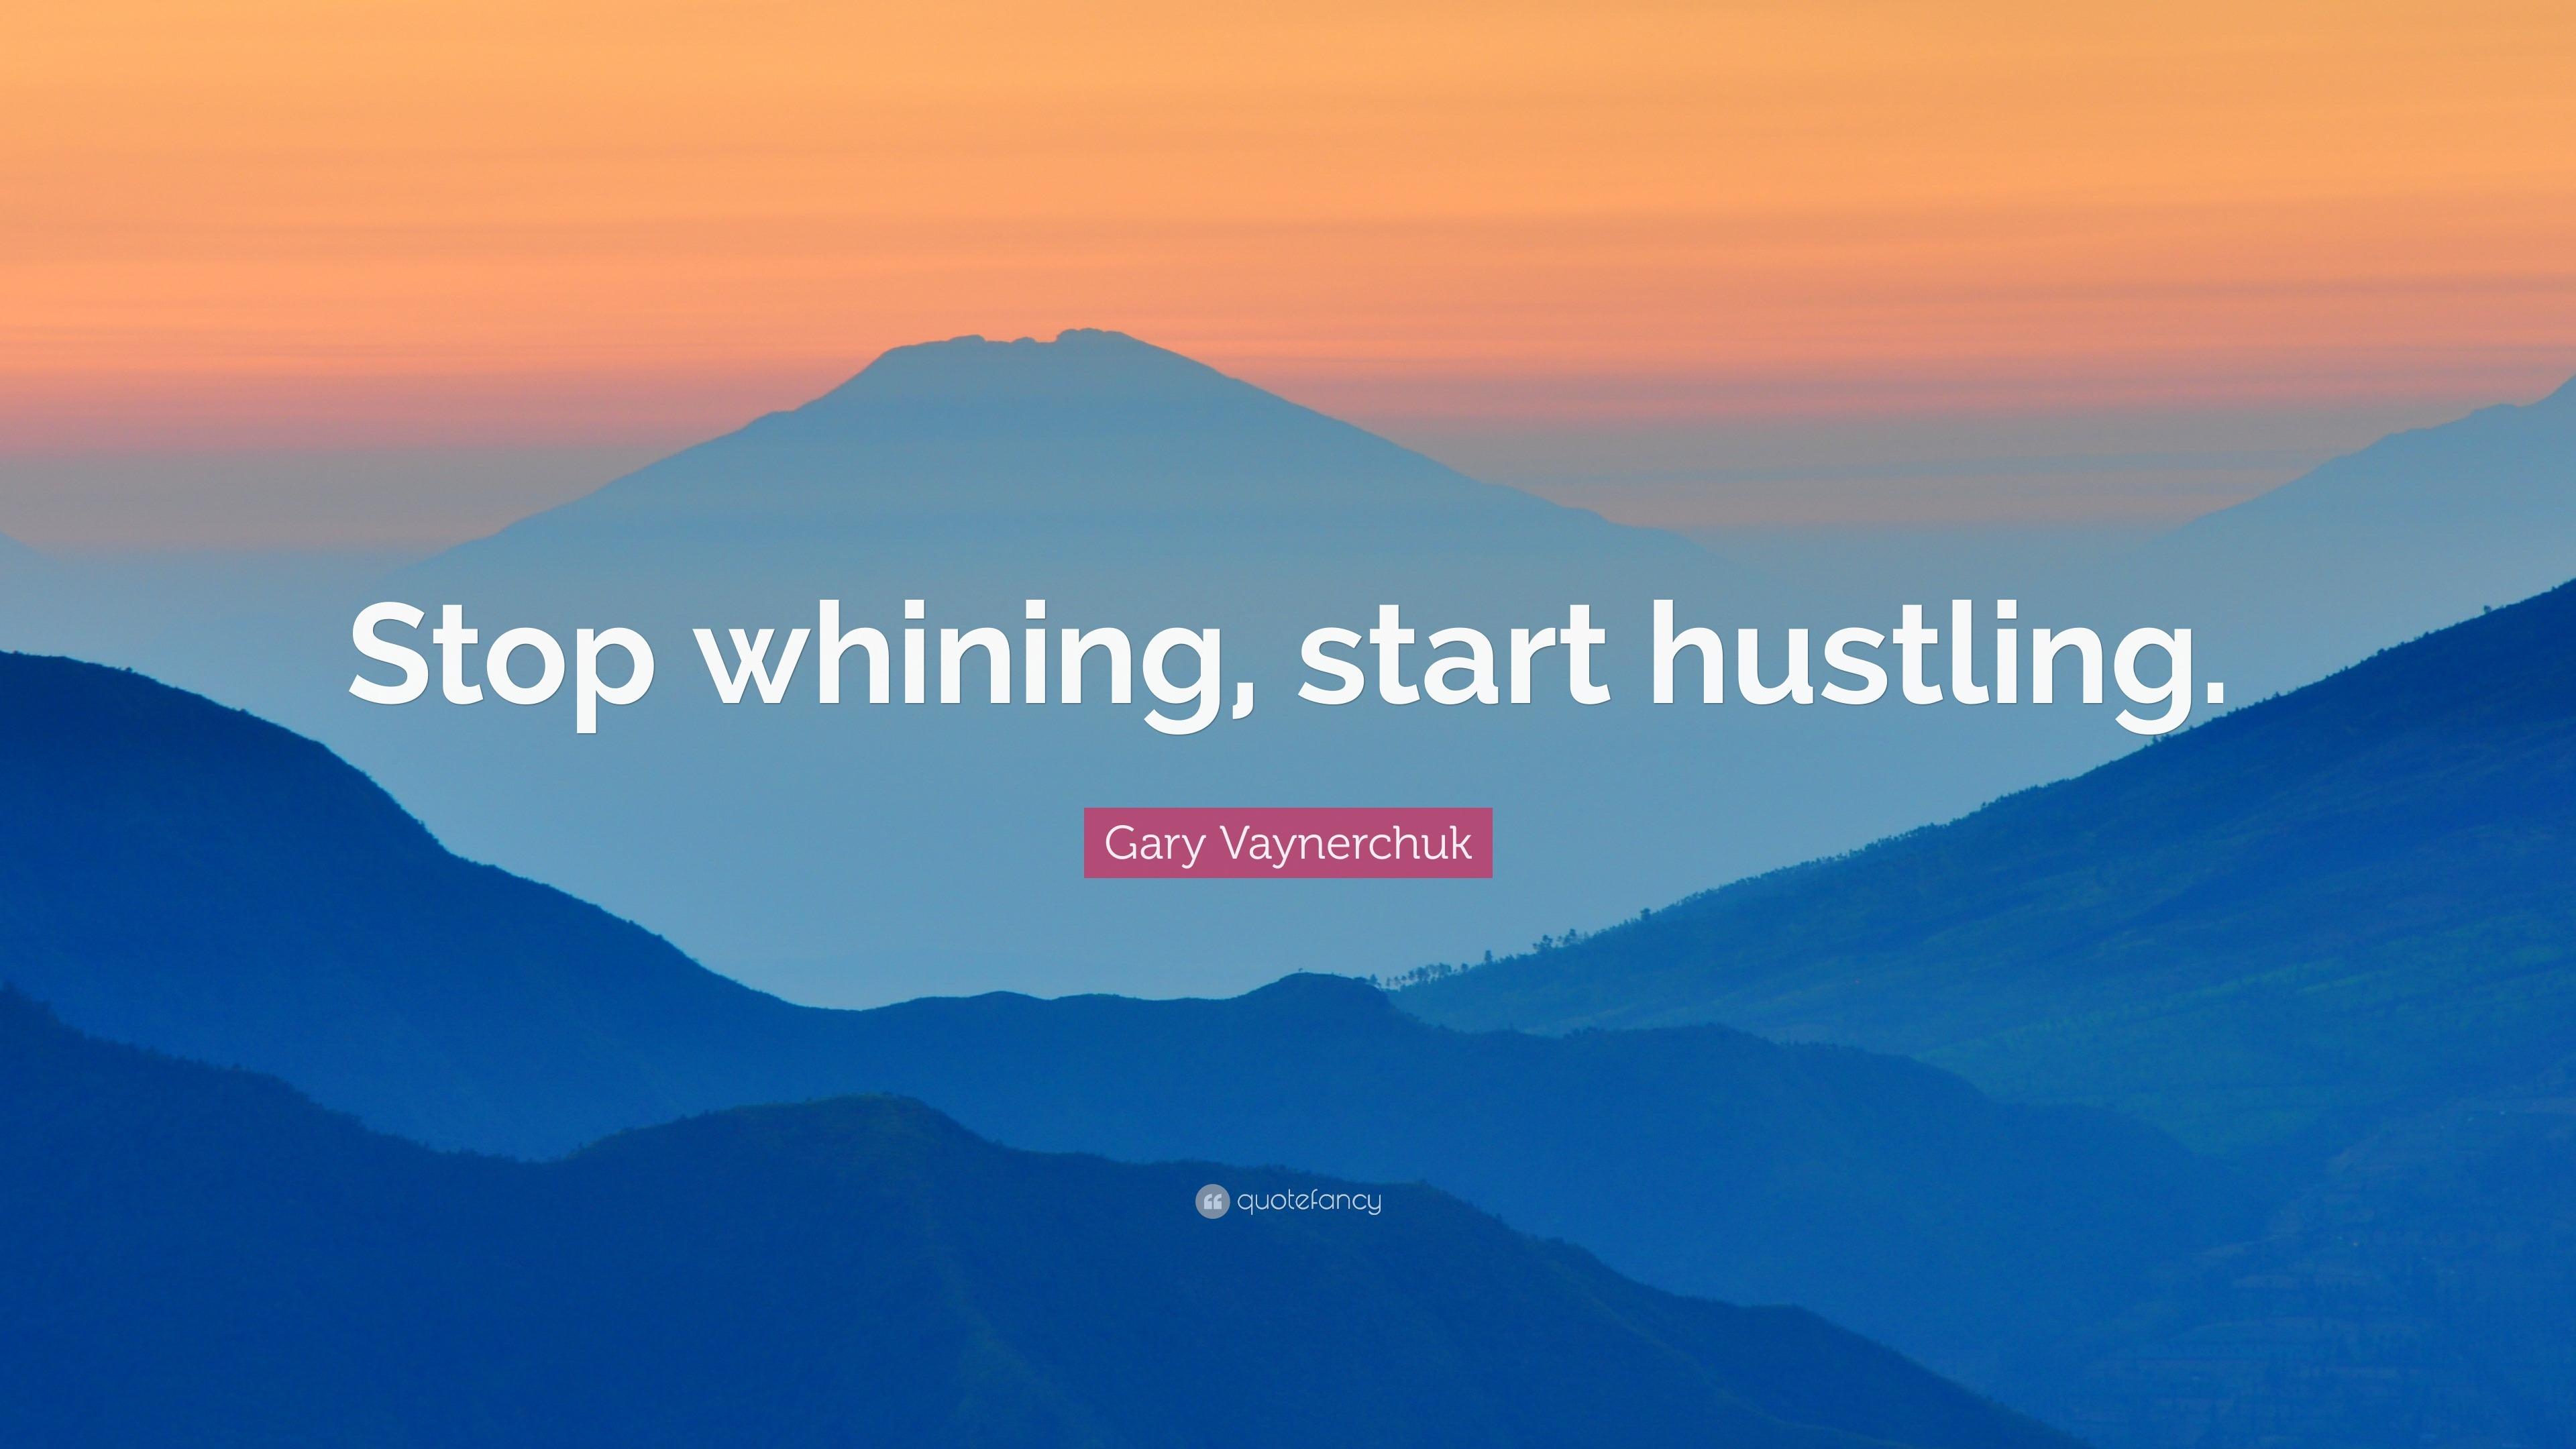 Gary Vee Wallpaper Quotes Garyvee Wallpapers Gary Vaynerchuk Medium